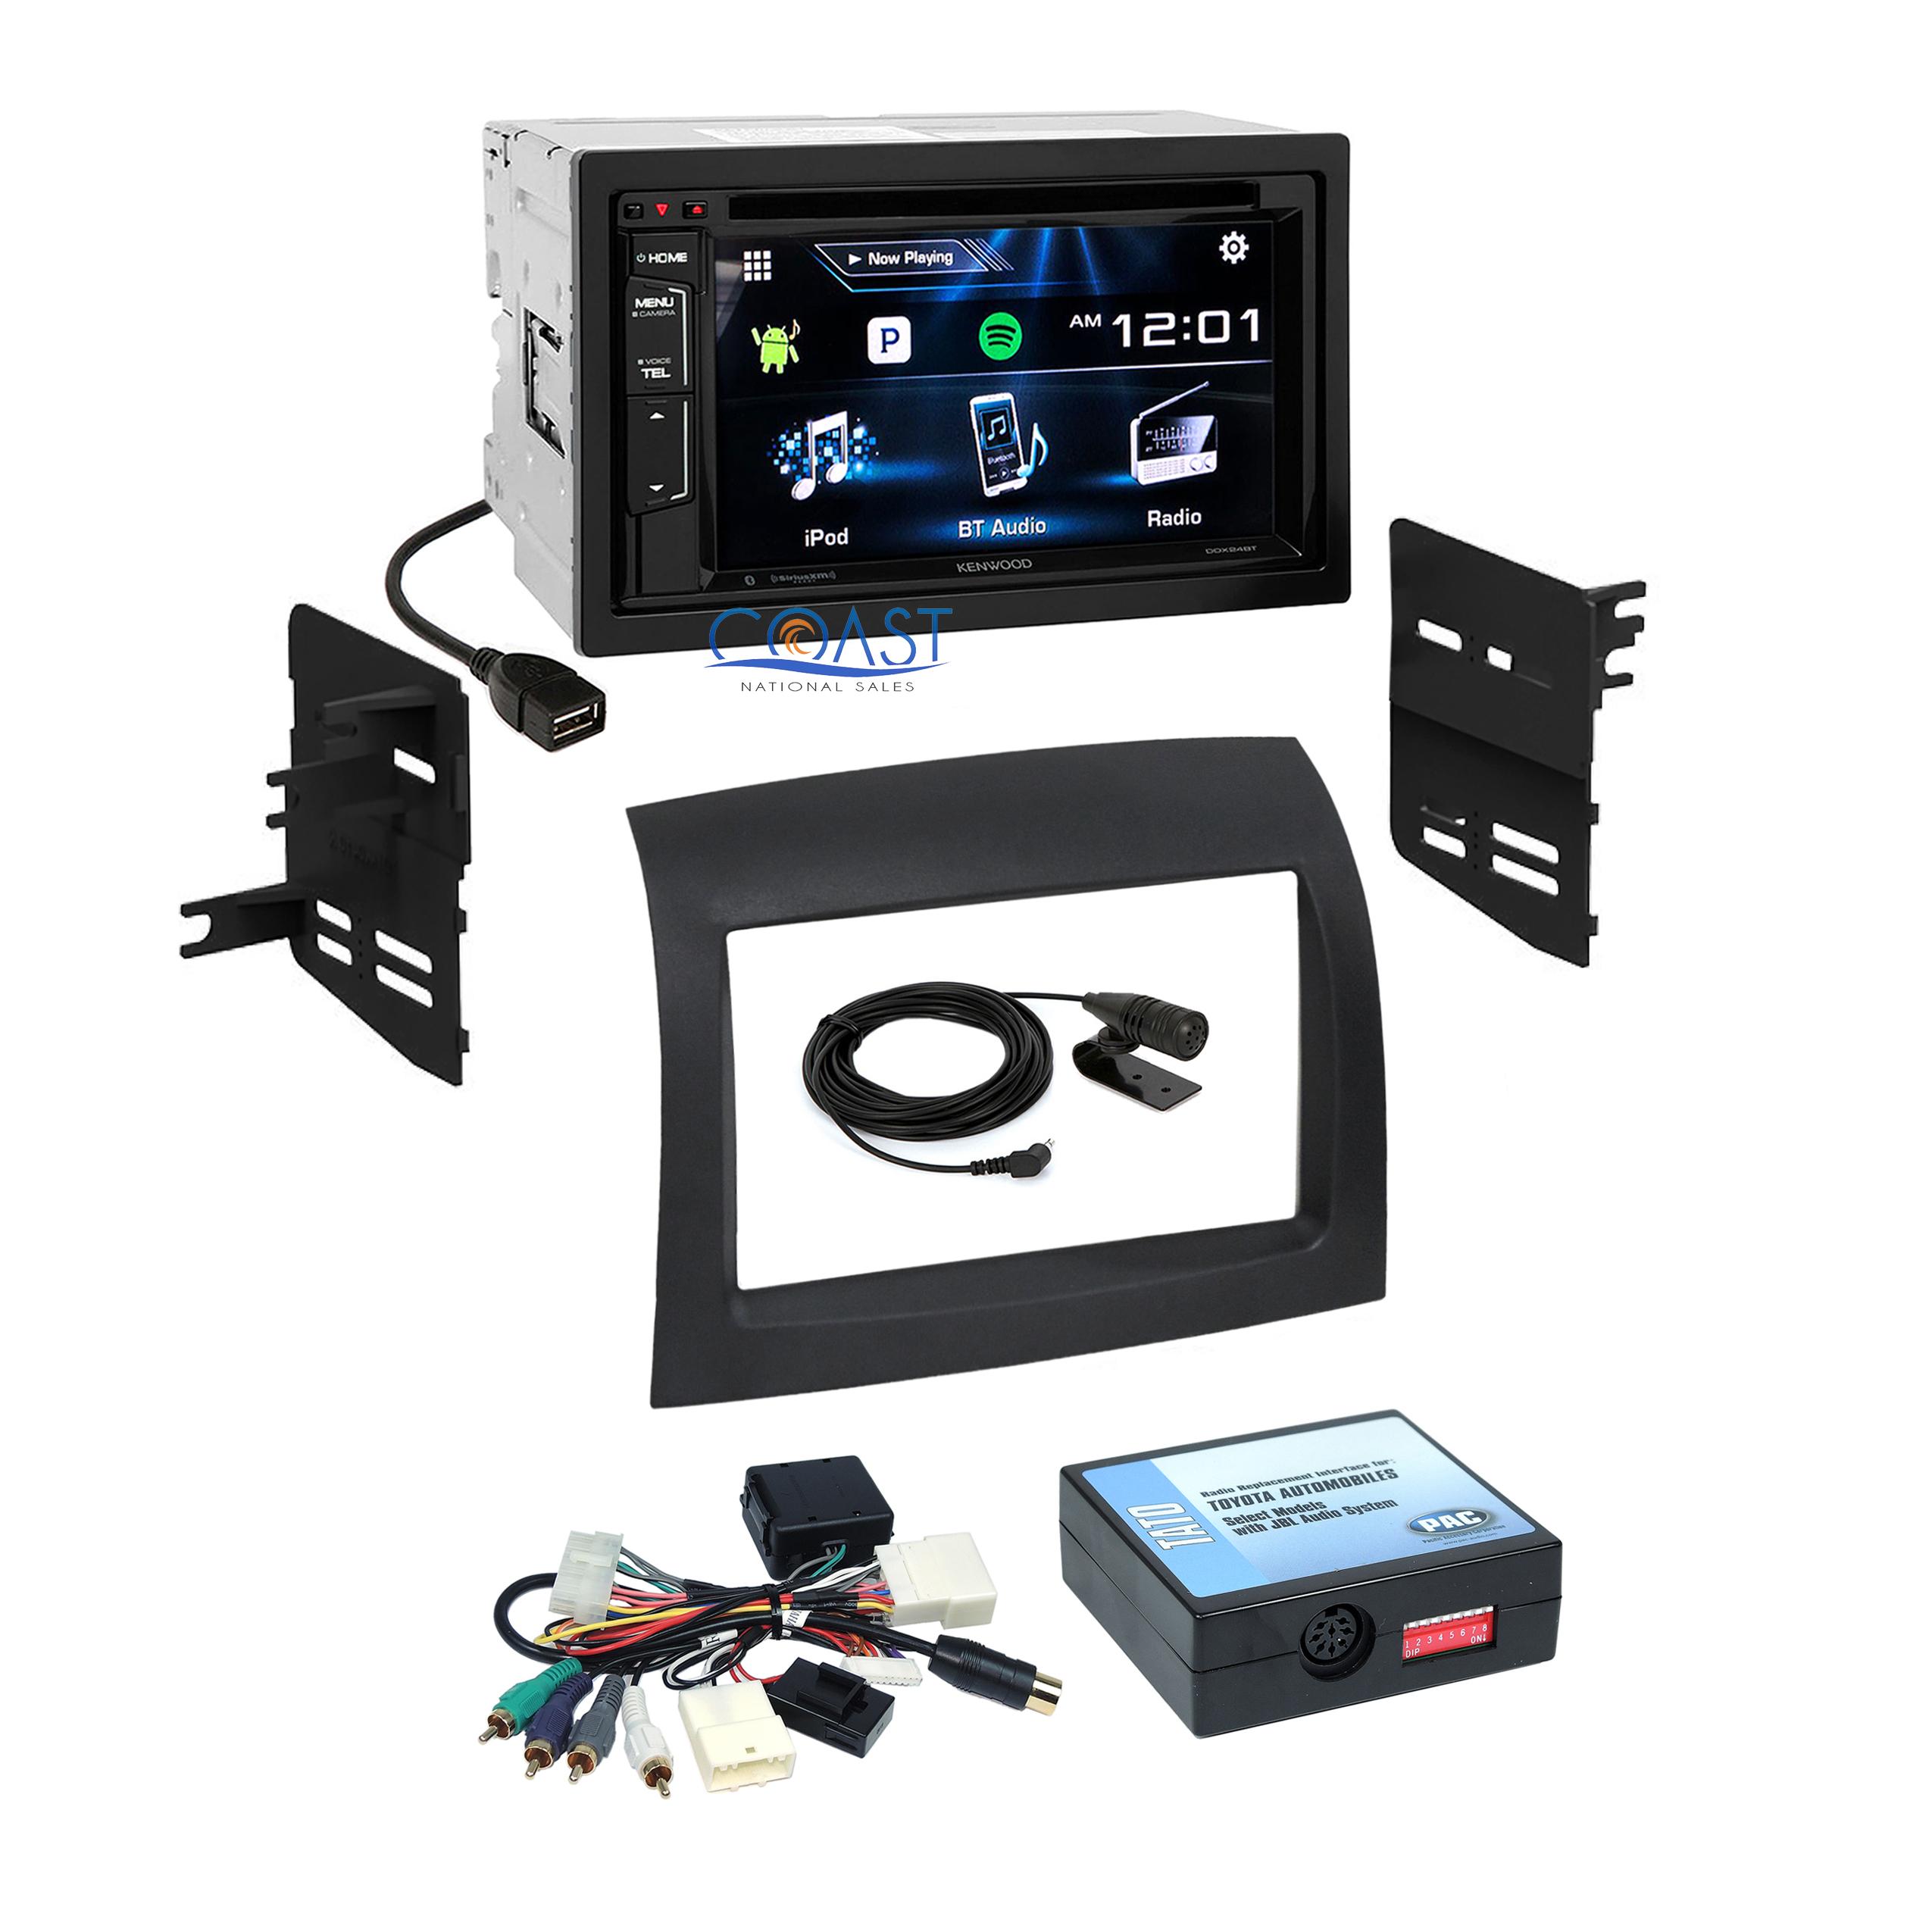 Kenwood Car Bluetooth Sirius Radio Dash Kit Jbl Harness For 04 10 Stereo Wiring Diagram Surround Sound Toyota Sienna